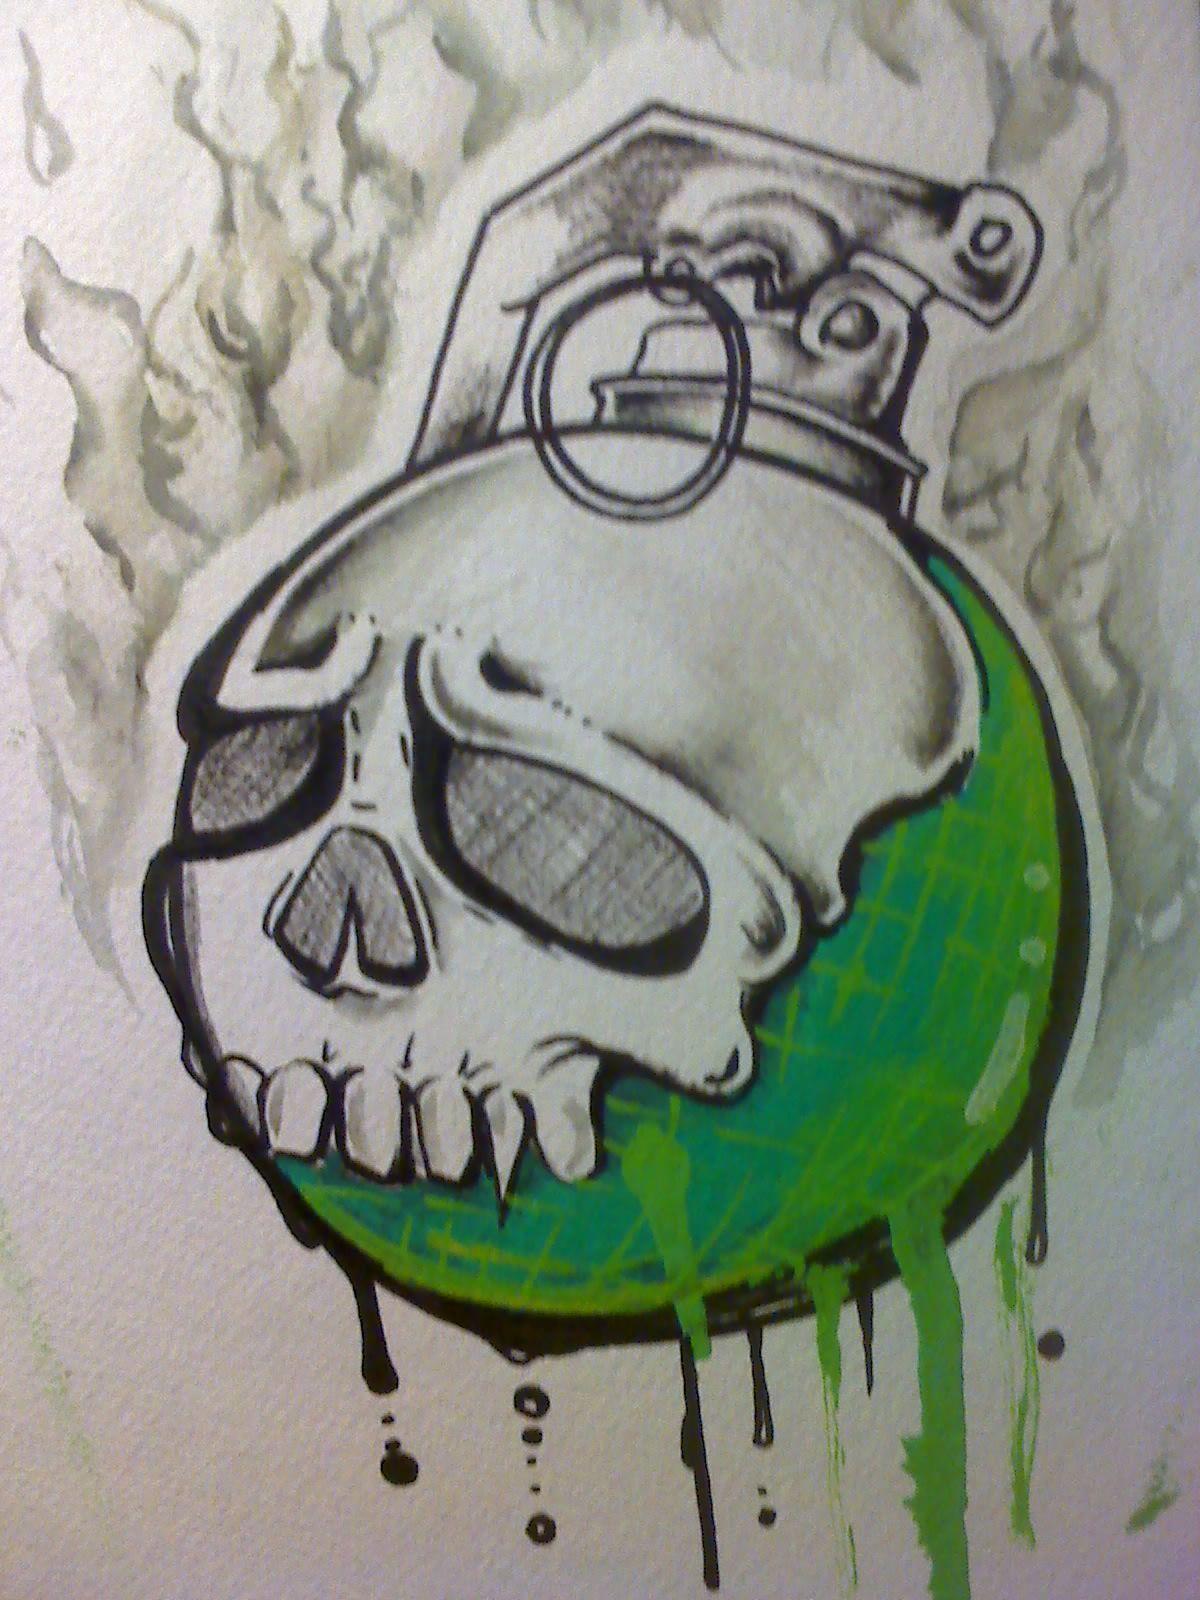 тату эскизы картинки граффити же, счастью, этим